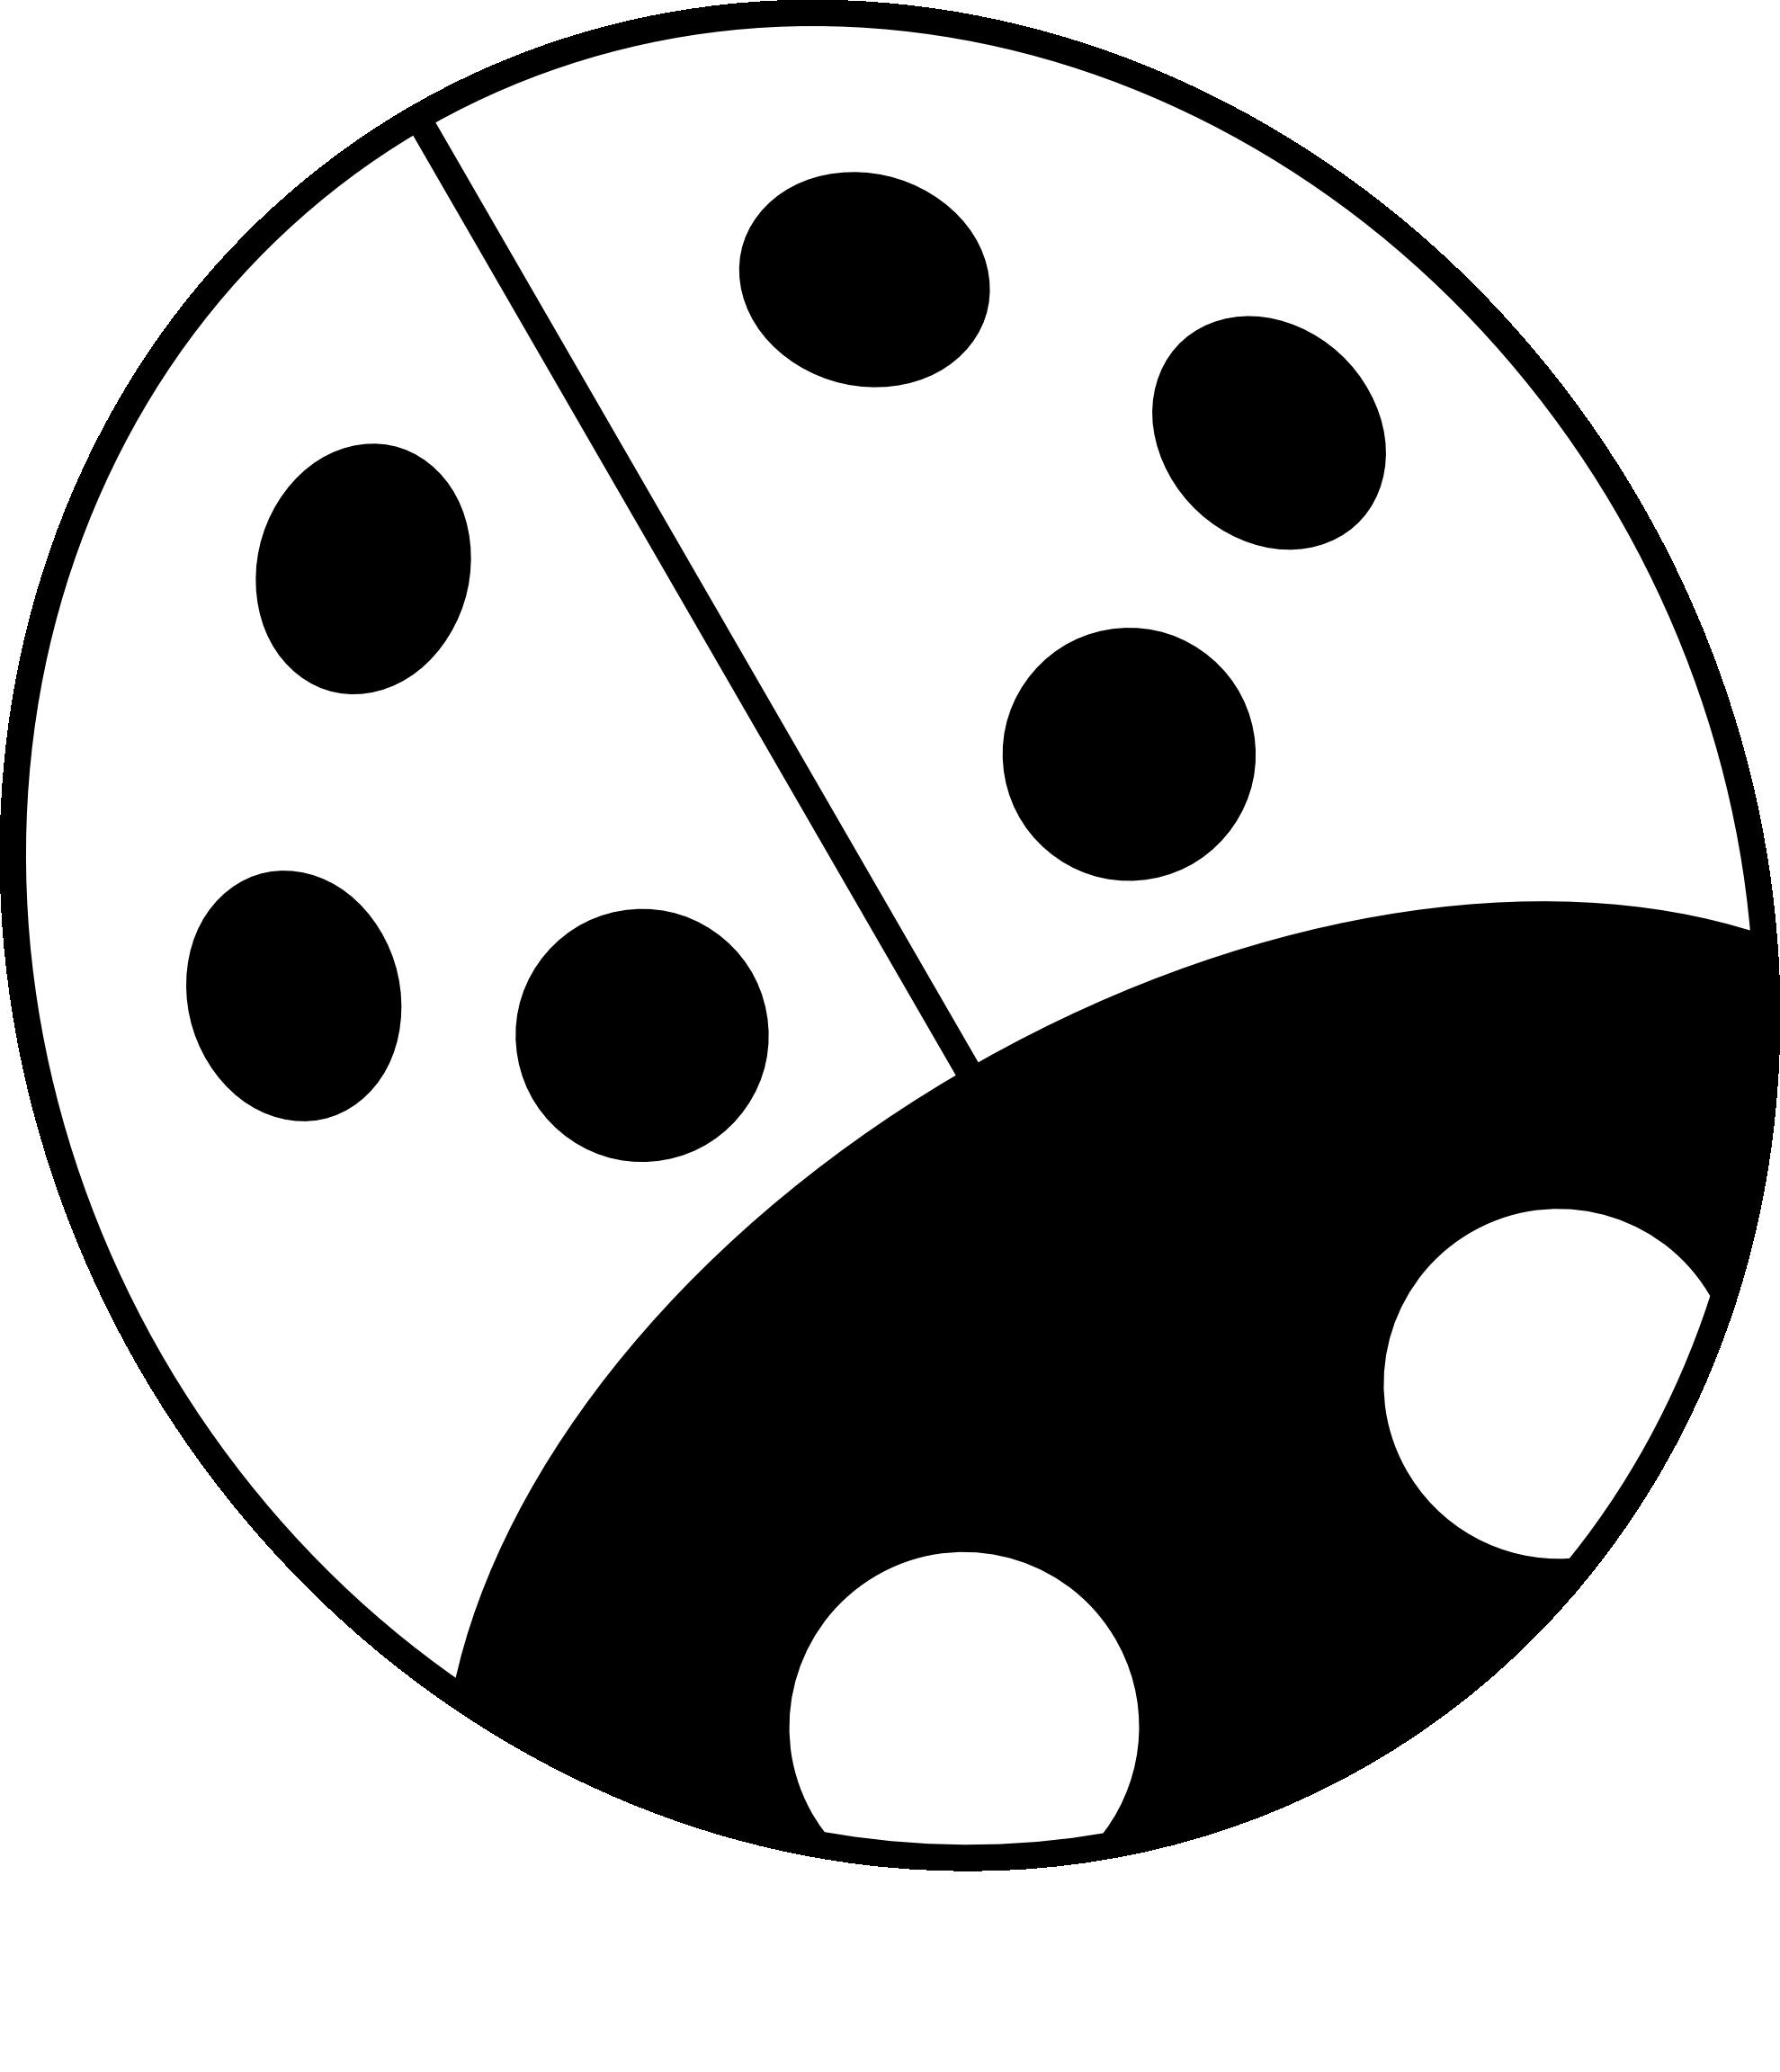 ladybug-clipart-black-and-white-KTjx5Grgc.png: www.clipartpanda.com/clipart_images/ladybug-12-black-white-42529347